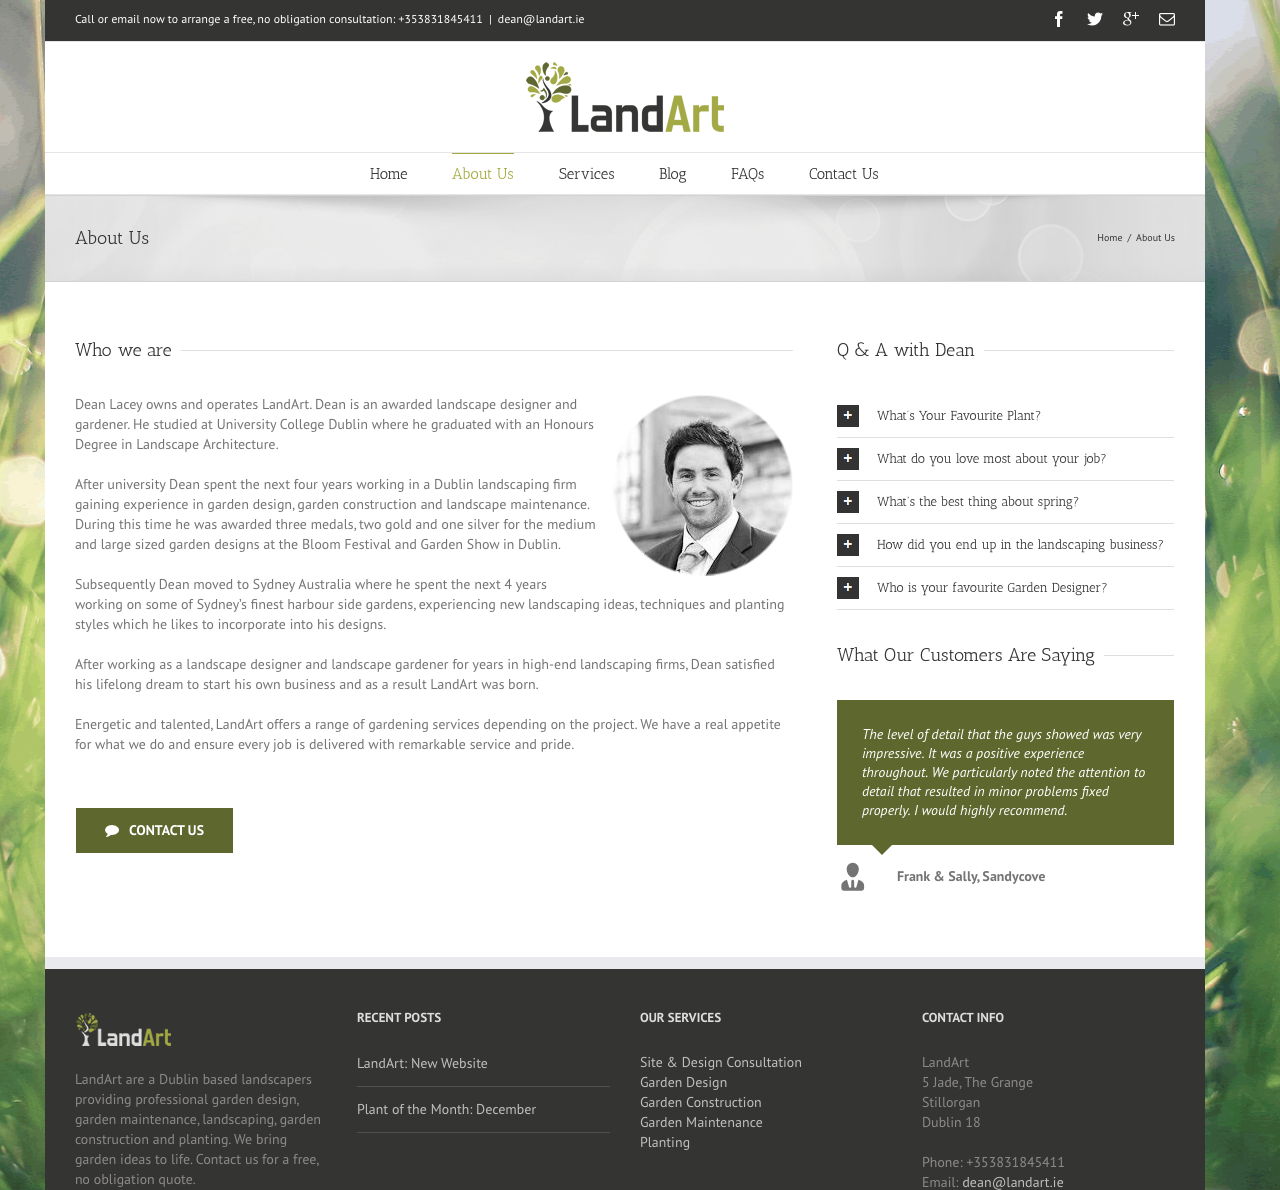 LandArt Website Design About